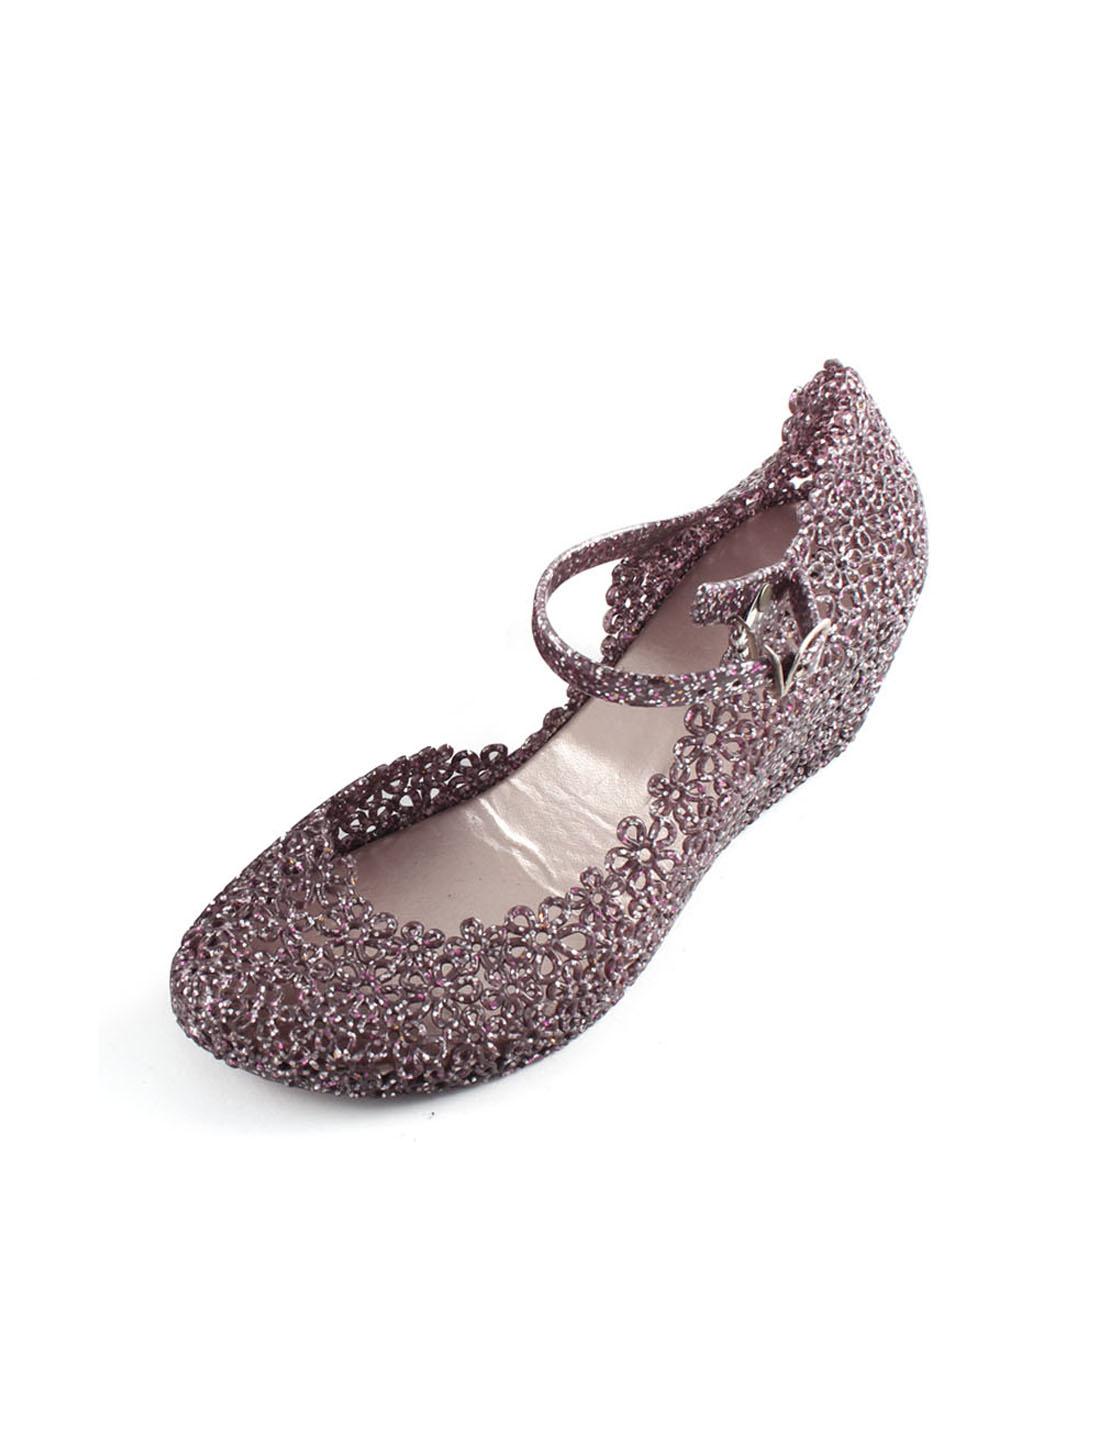 Ladies Floral Decor Hollow Out Strappy Slipsole Sandals Shoes Dark Purple Pair US 4